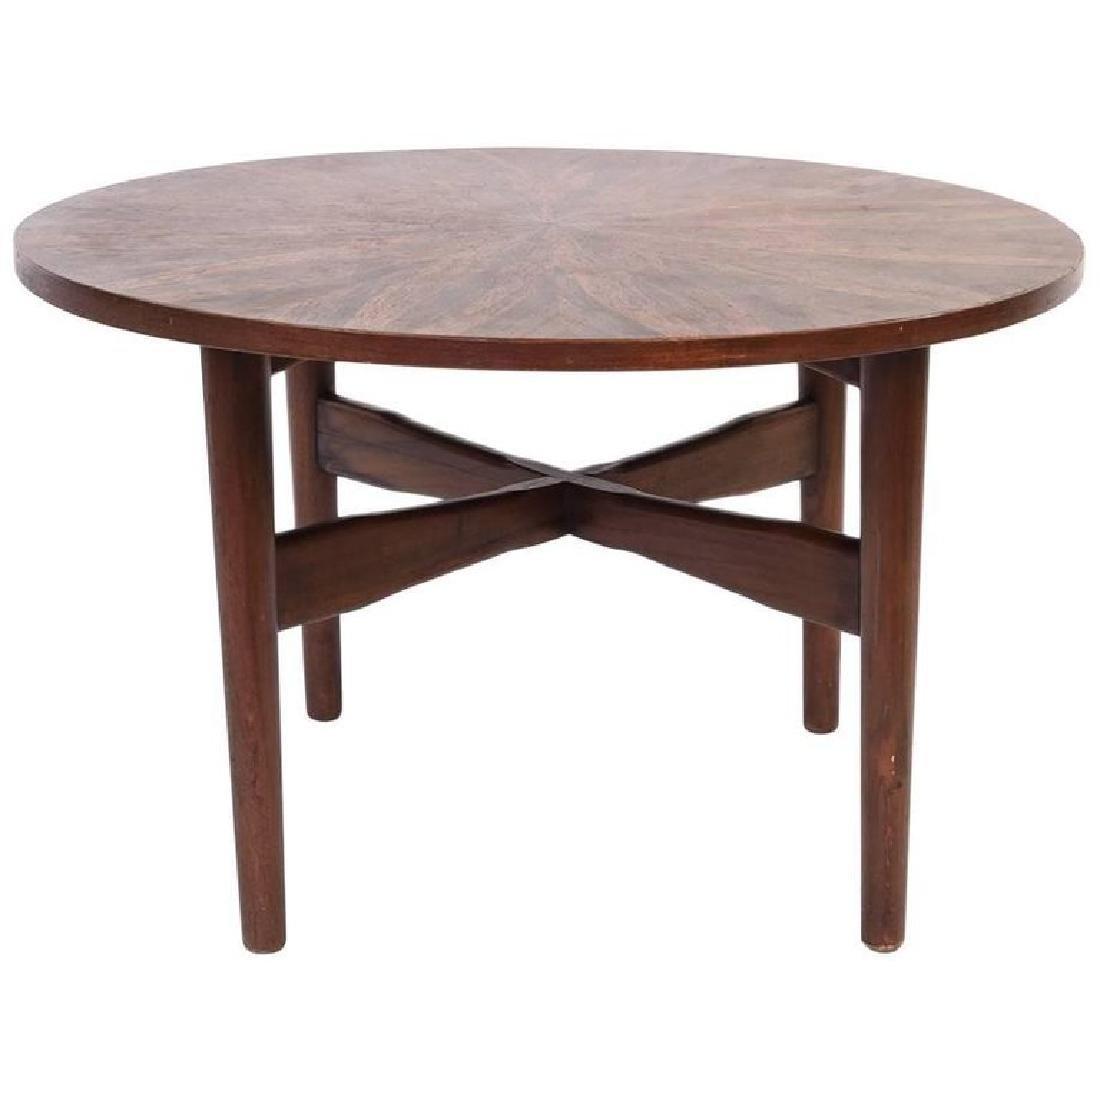 H.W. KLEIN FOR BRAMIN DANISH COFFEE TABLE